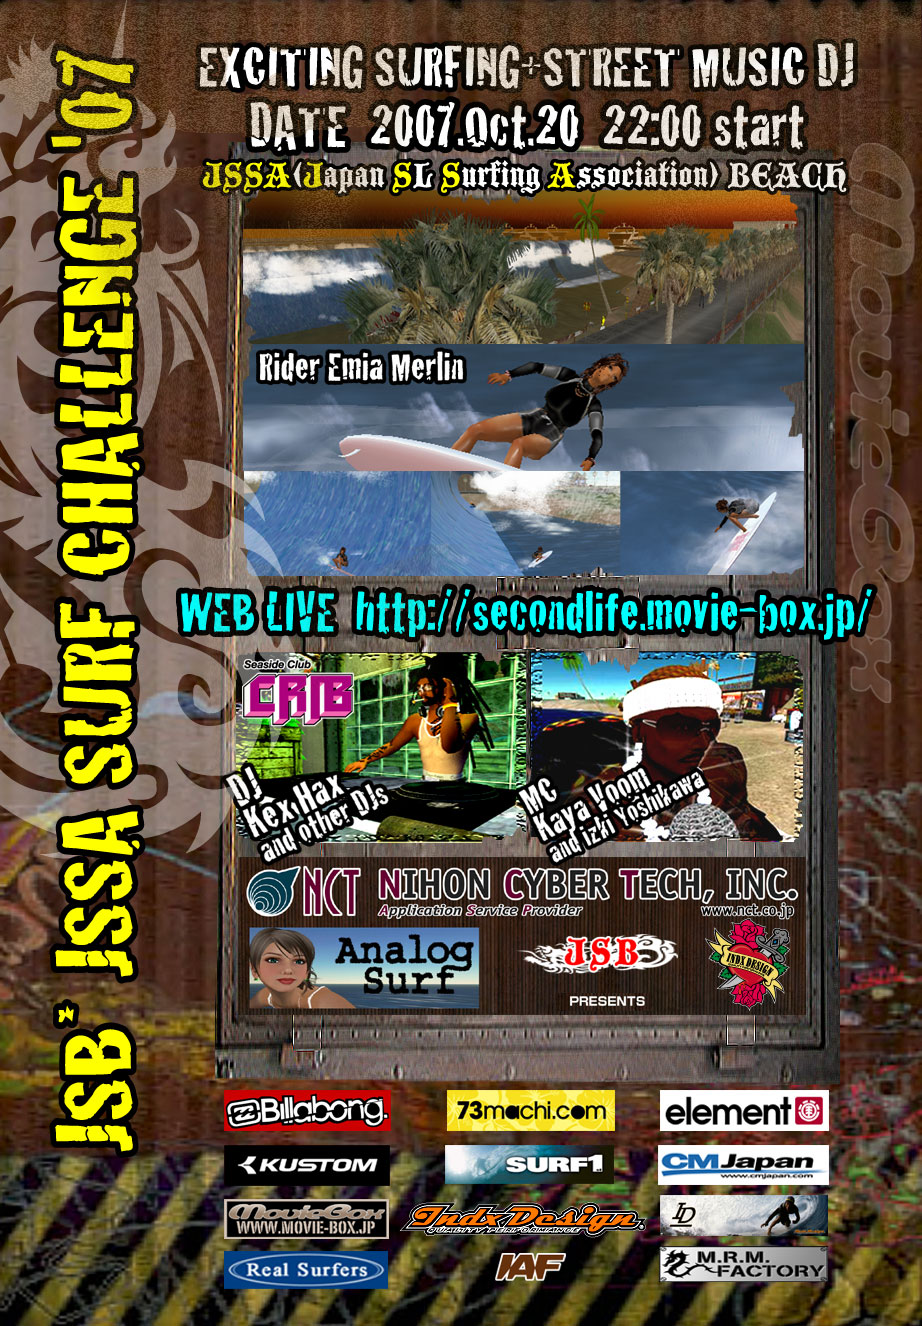 JSB*JSSA SURF CHALLENGE